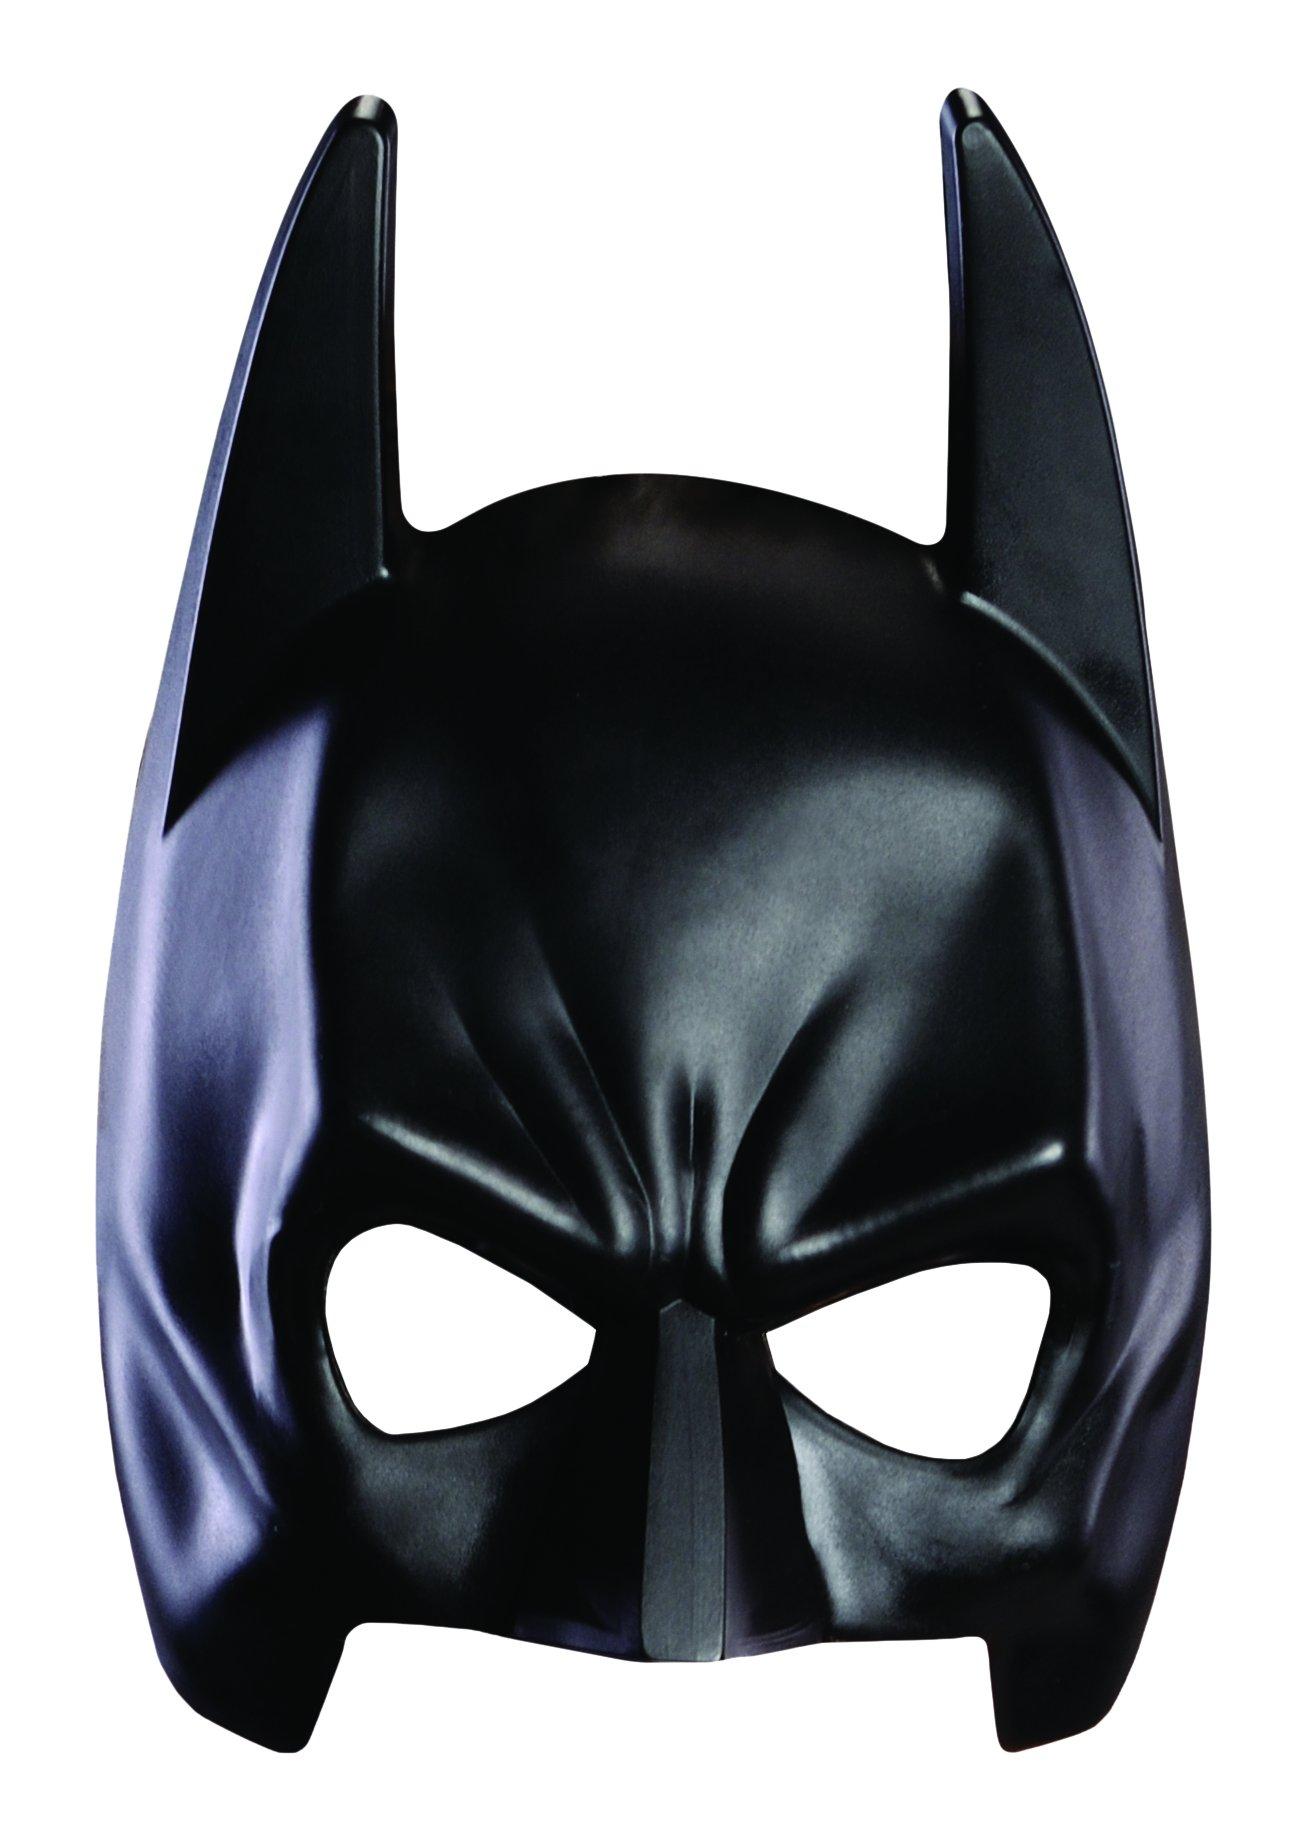 Batman The Dark Knight Rises Mask product image